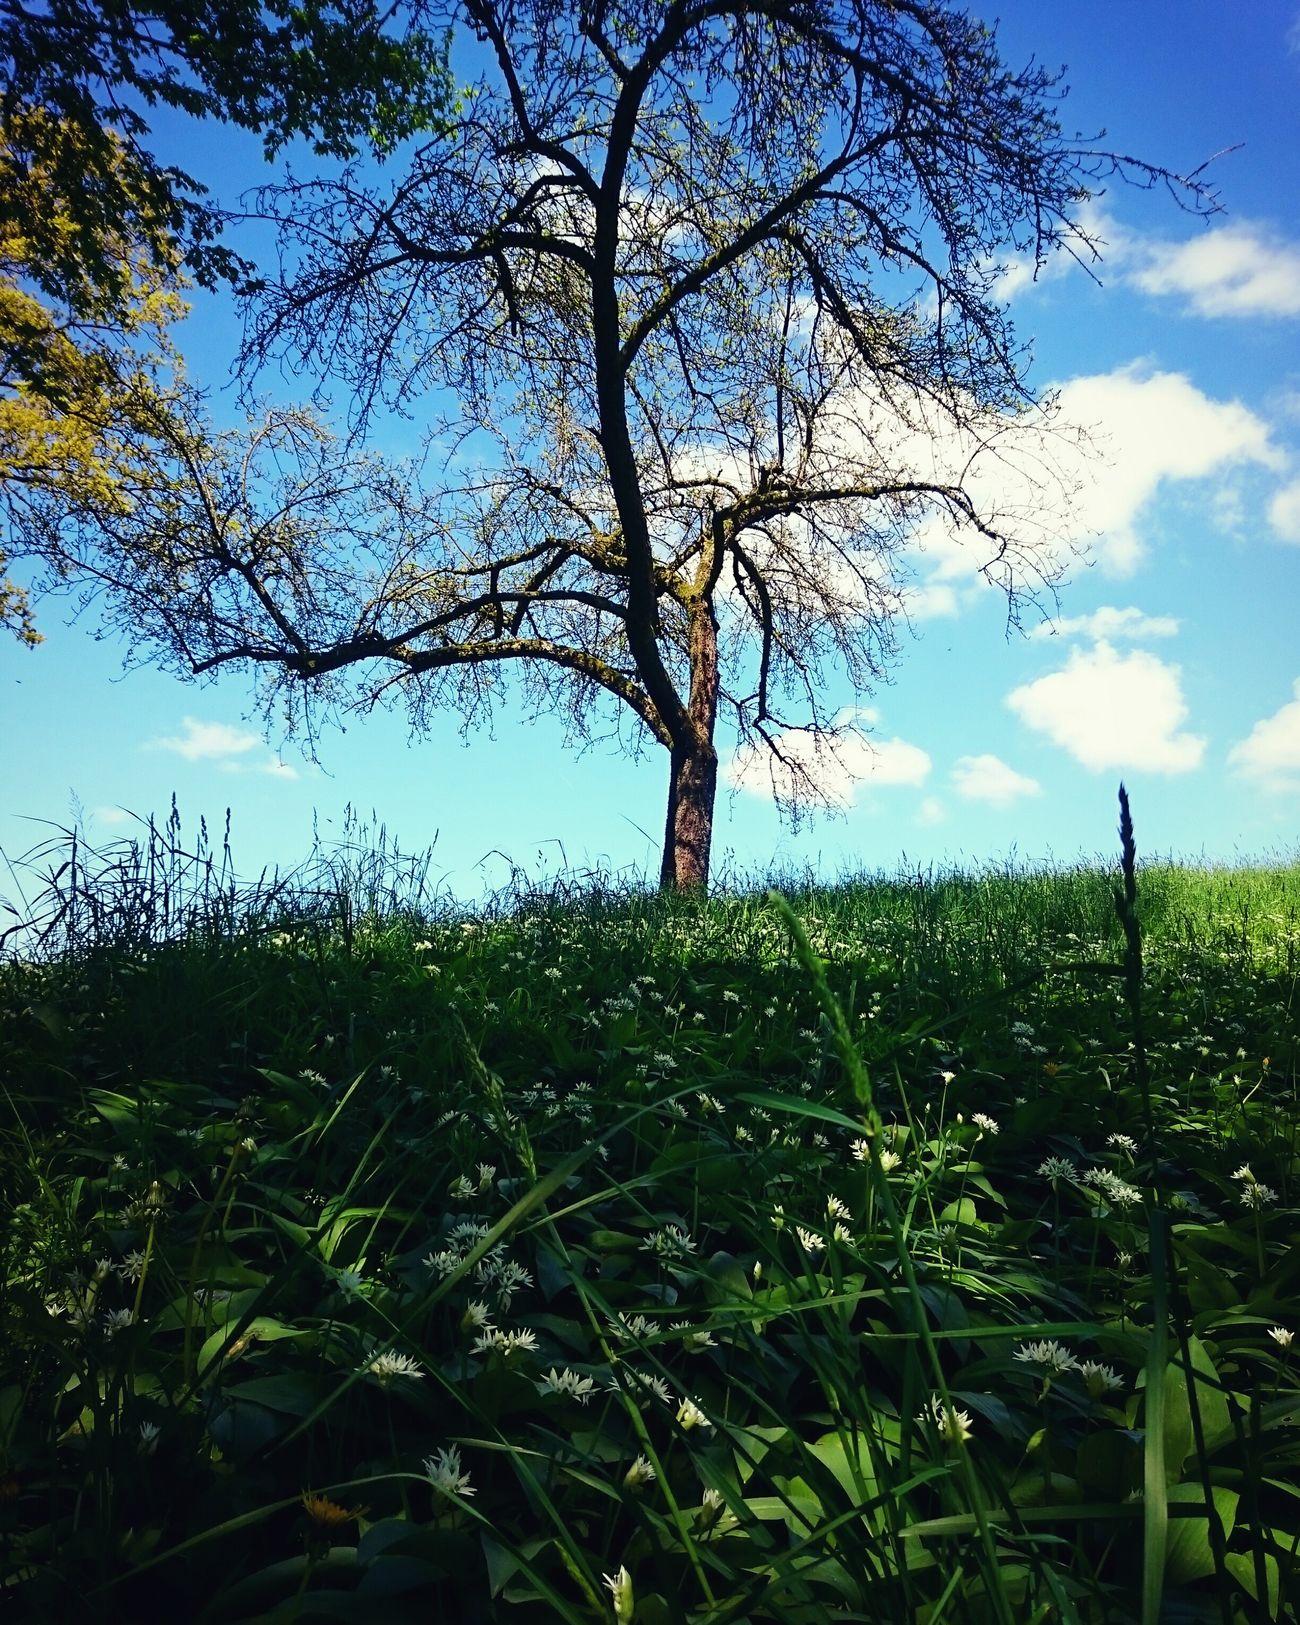 Natur pur 😍 First Eyeem Photo Treelover  Nature Photography Naturpur Wanderlust Bärlauch  Baum